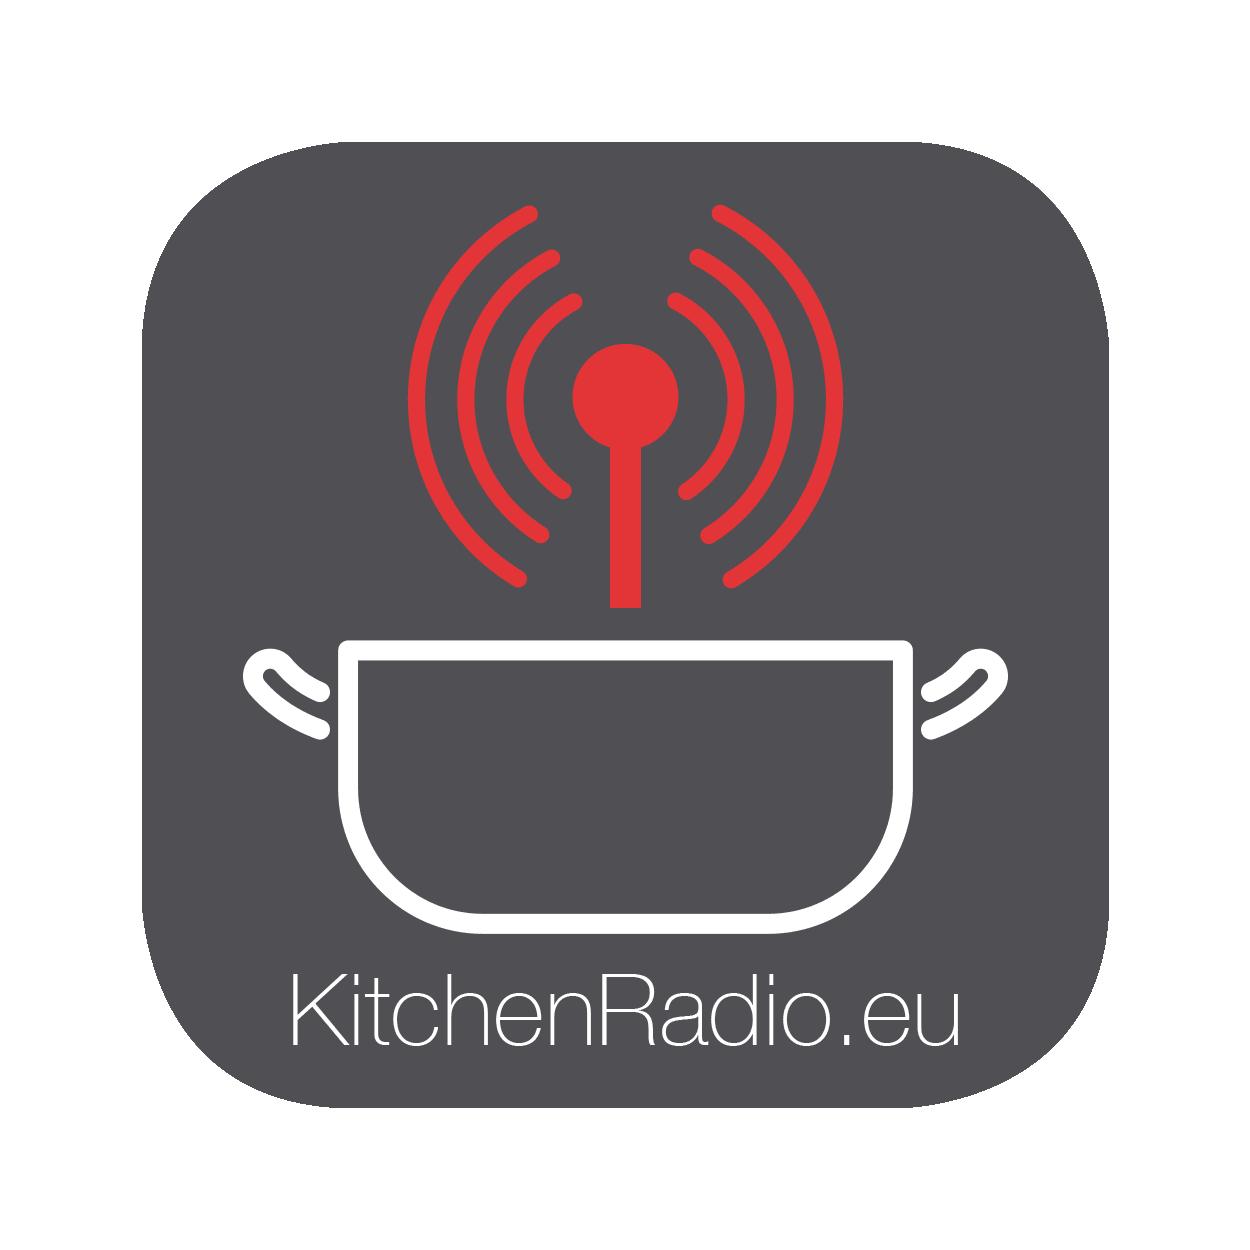 KitchenRadio